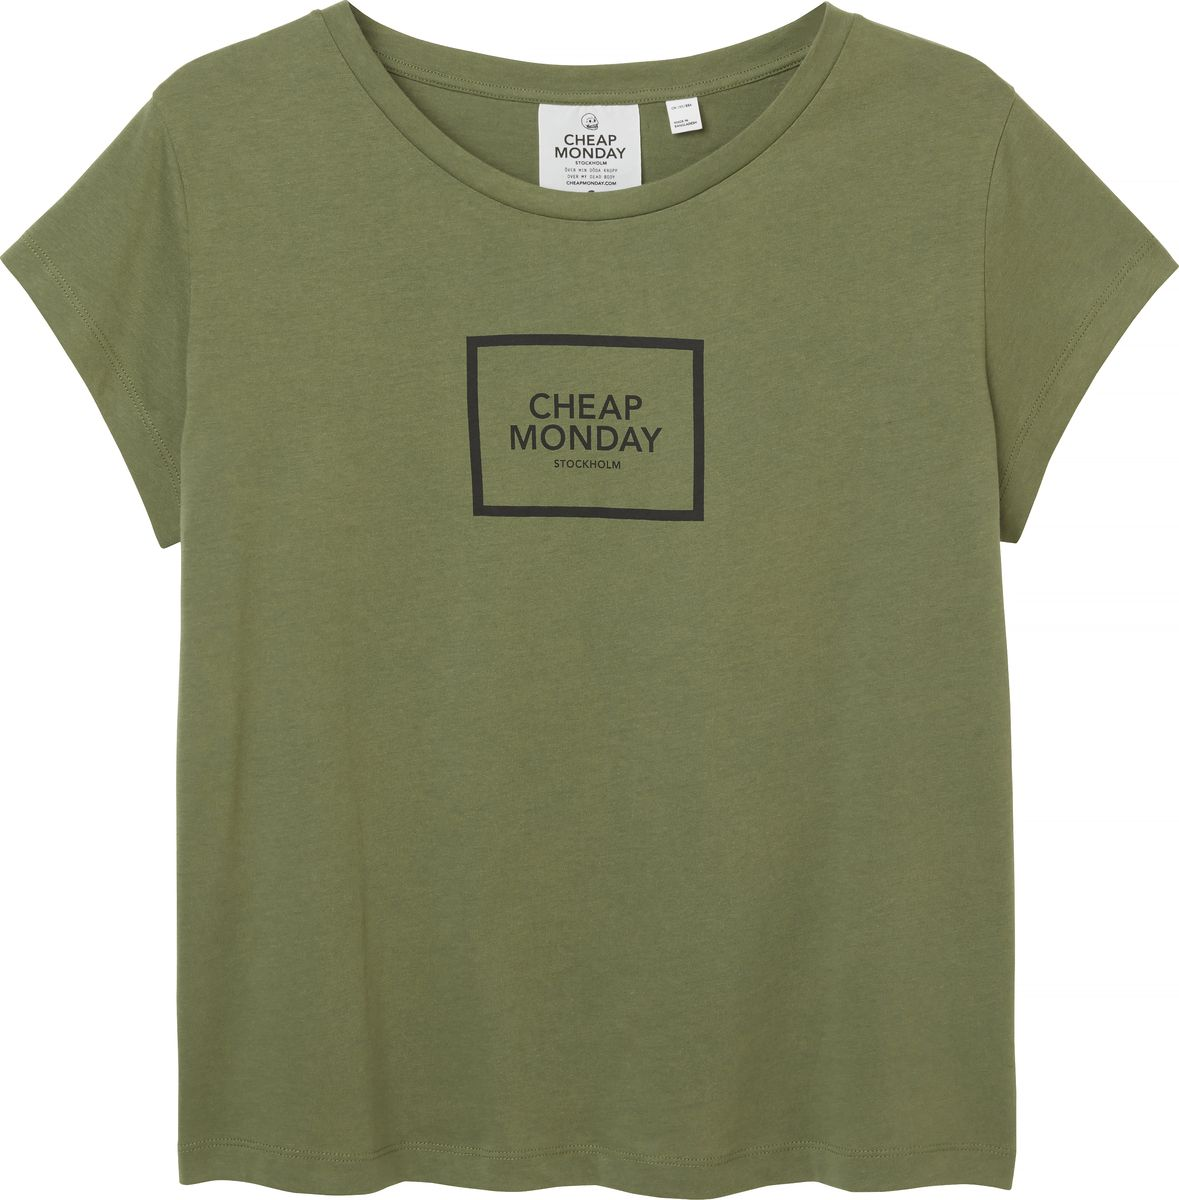 Футболка женская Cheap Monday, цвет: оливковый. 0506127. Размер XS (40) свитшот женский cheap monday цвет оливковый 0556772 размер m 44